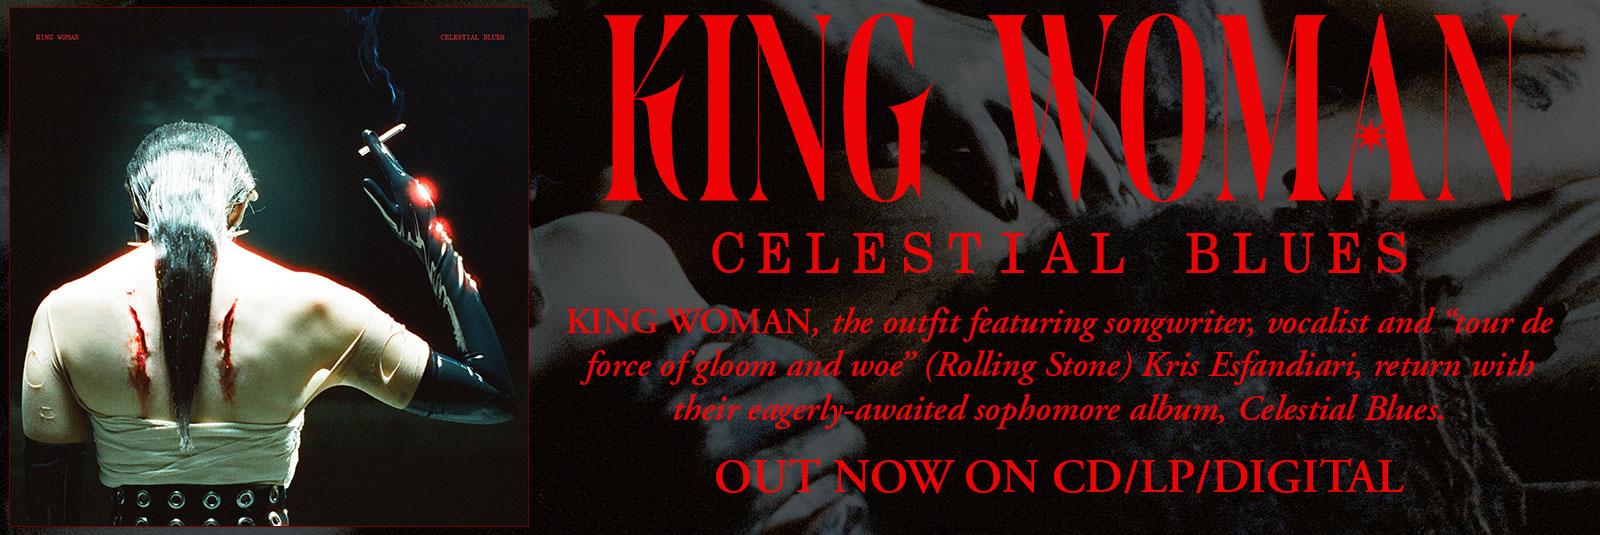 king-woman-celestial-blues